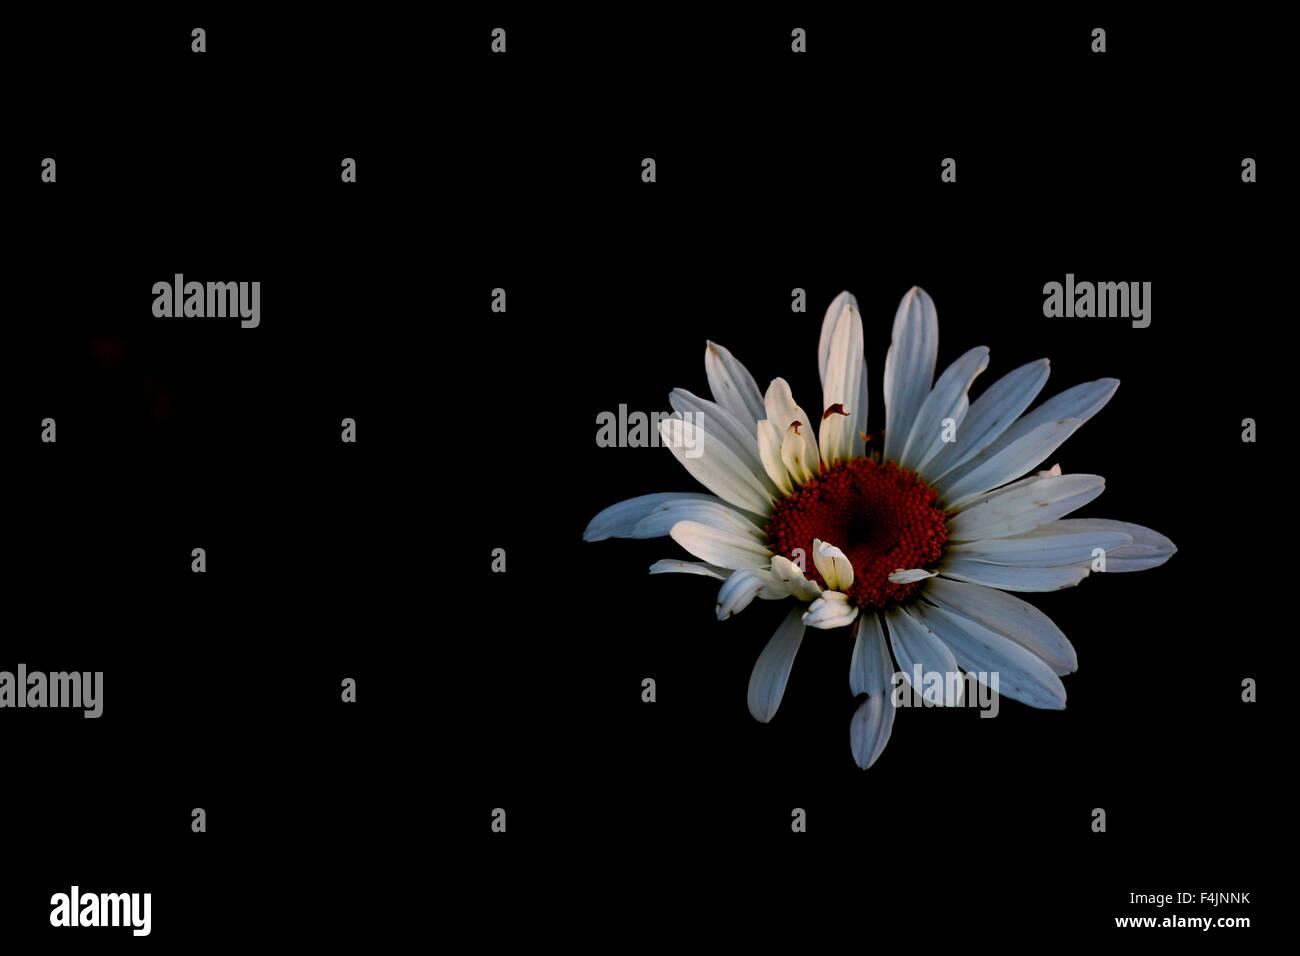 Flower sitting in darkness - Stock Image